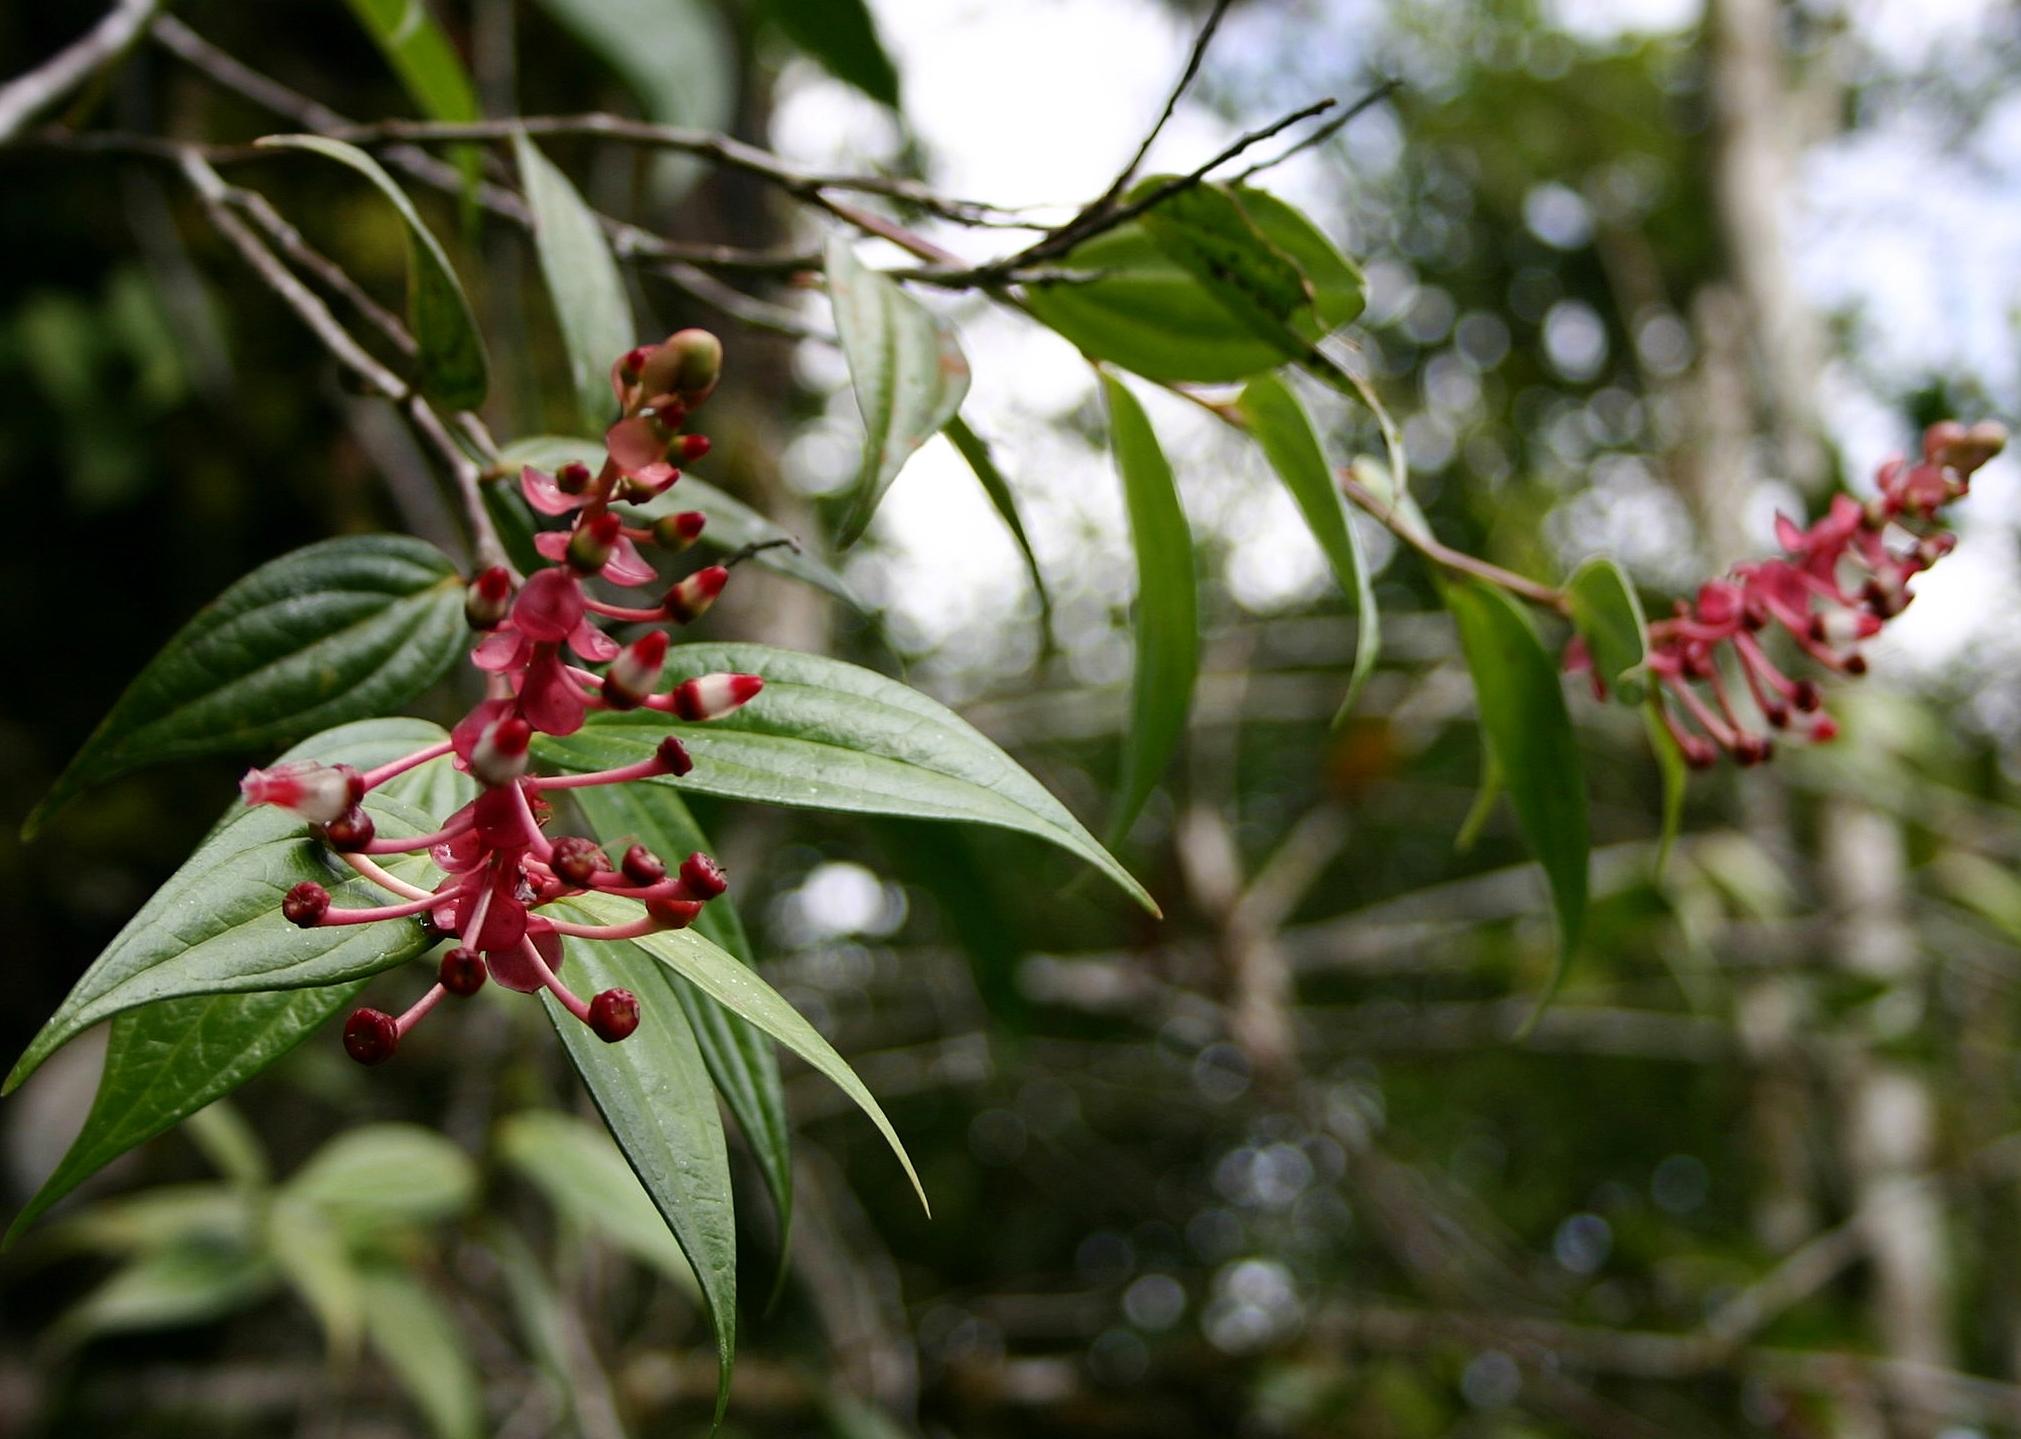 Cavendishia bracteata , San Pedro Carchá, Alta Verapaz Department, Guatemala.